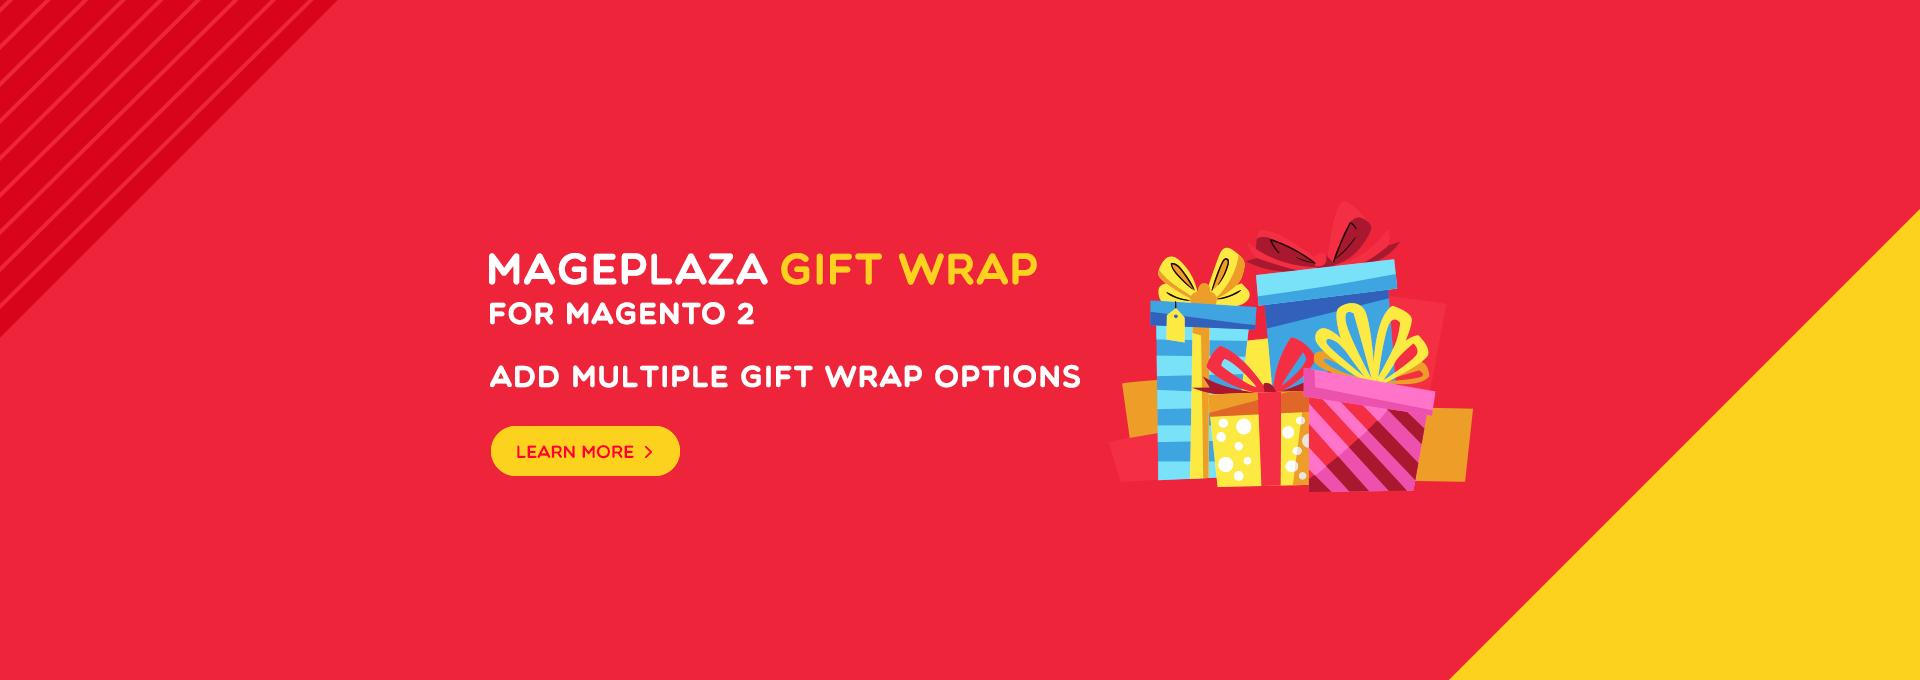 magento 2 gift wrap